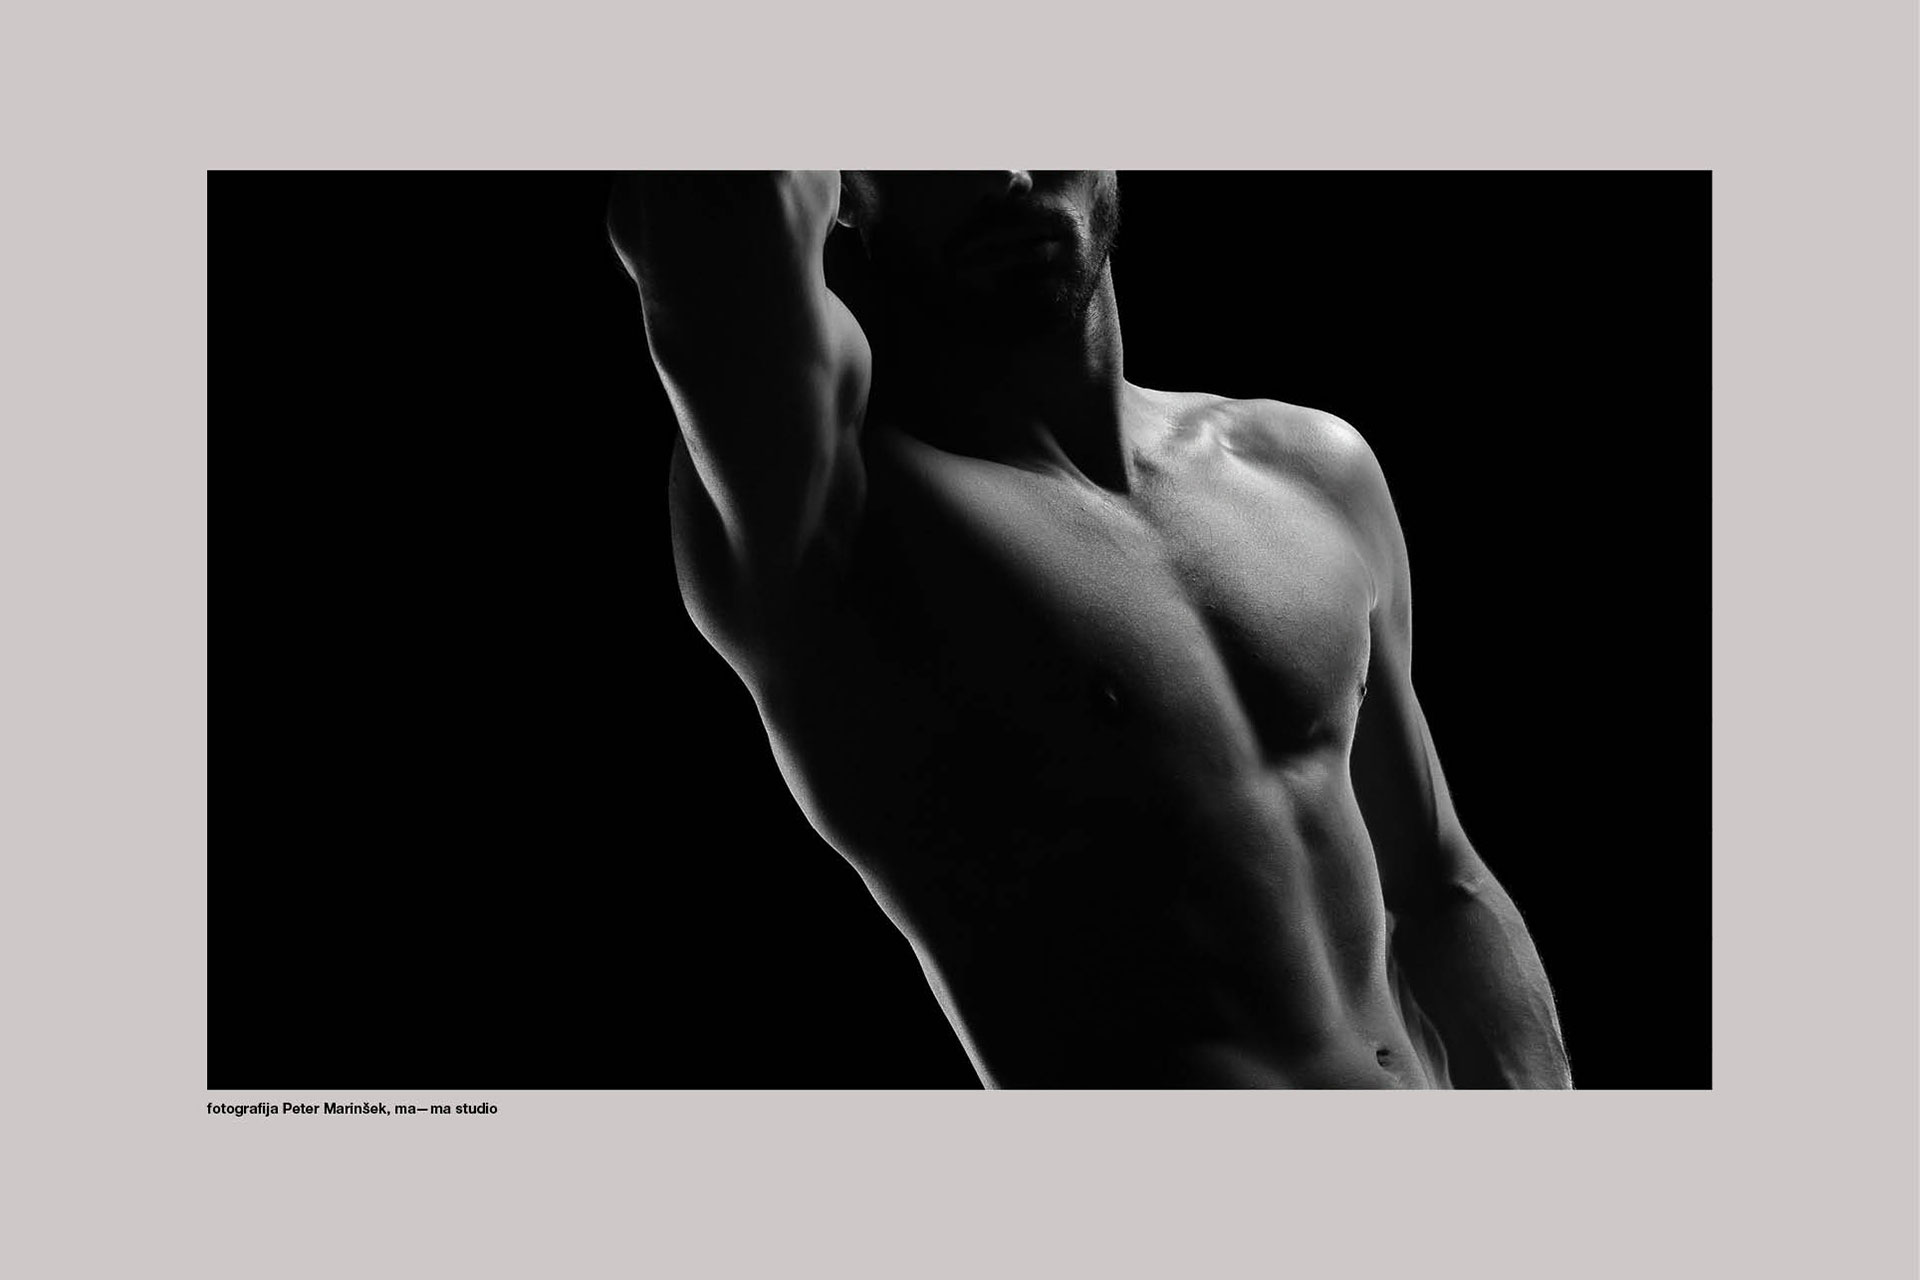 elastomeri_peter_marinsek_fotografija_studio_ma-ma9